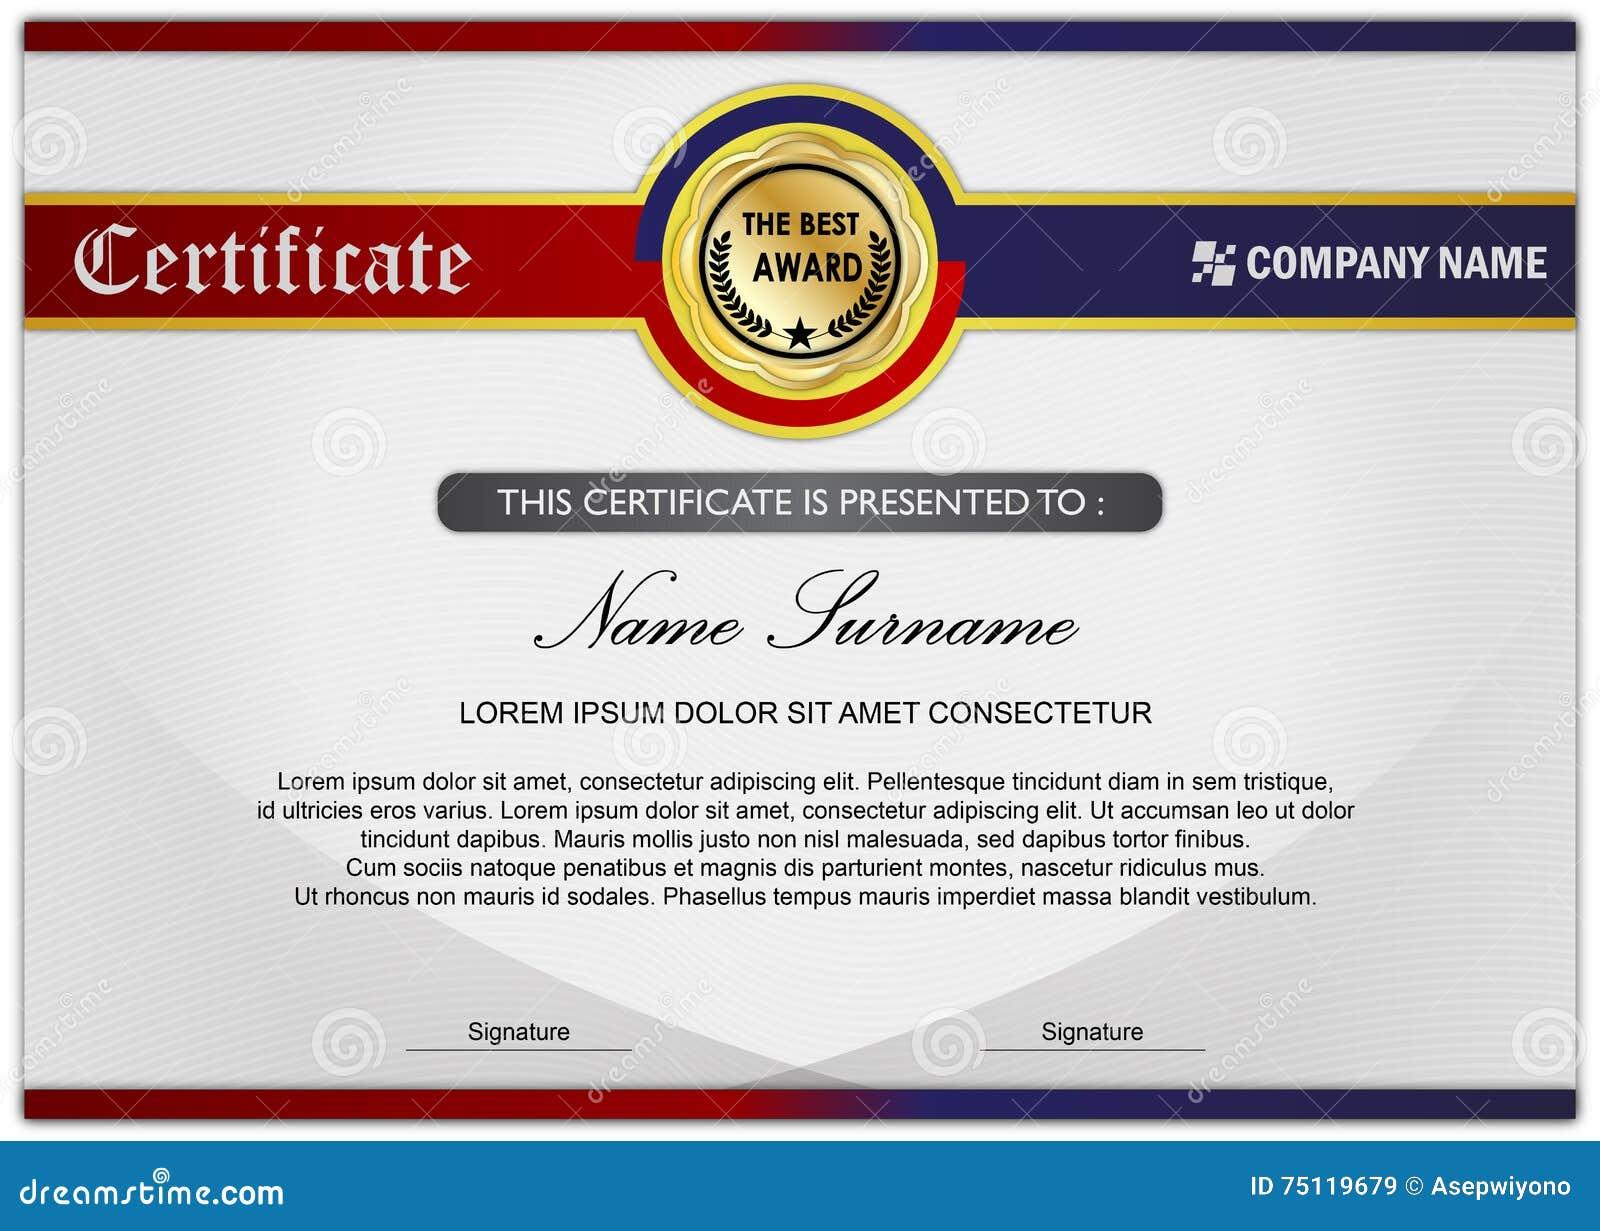 Certificate award diploma template circle icon stock certificate award diploma template circle icon xflitez Choice Image